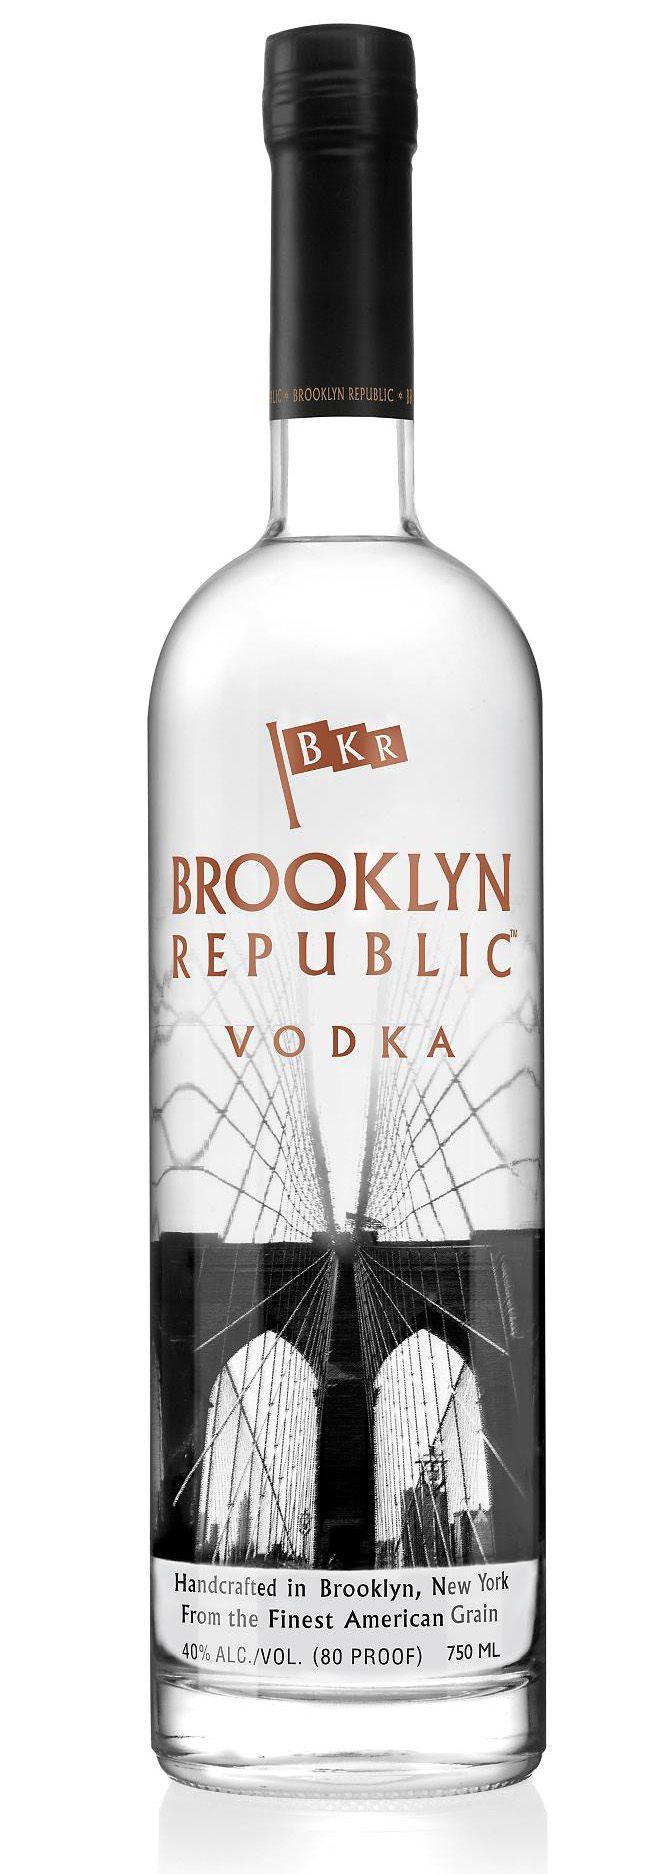 Industry City Distillery. A sugar beet vodka distillery in ... - Brooklyn Republic Vodka Bottle. Love the bridge silkscreen.